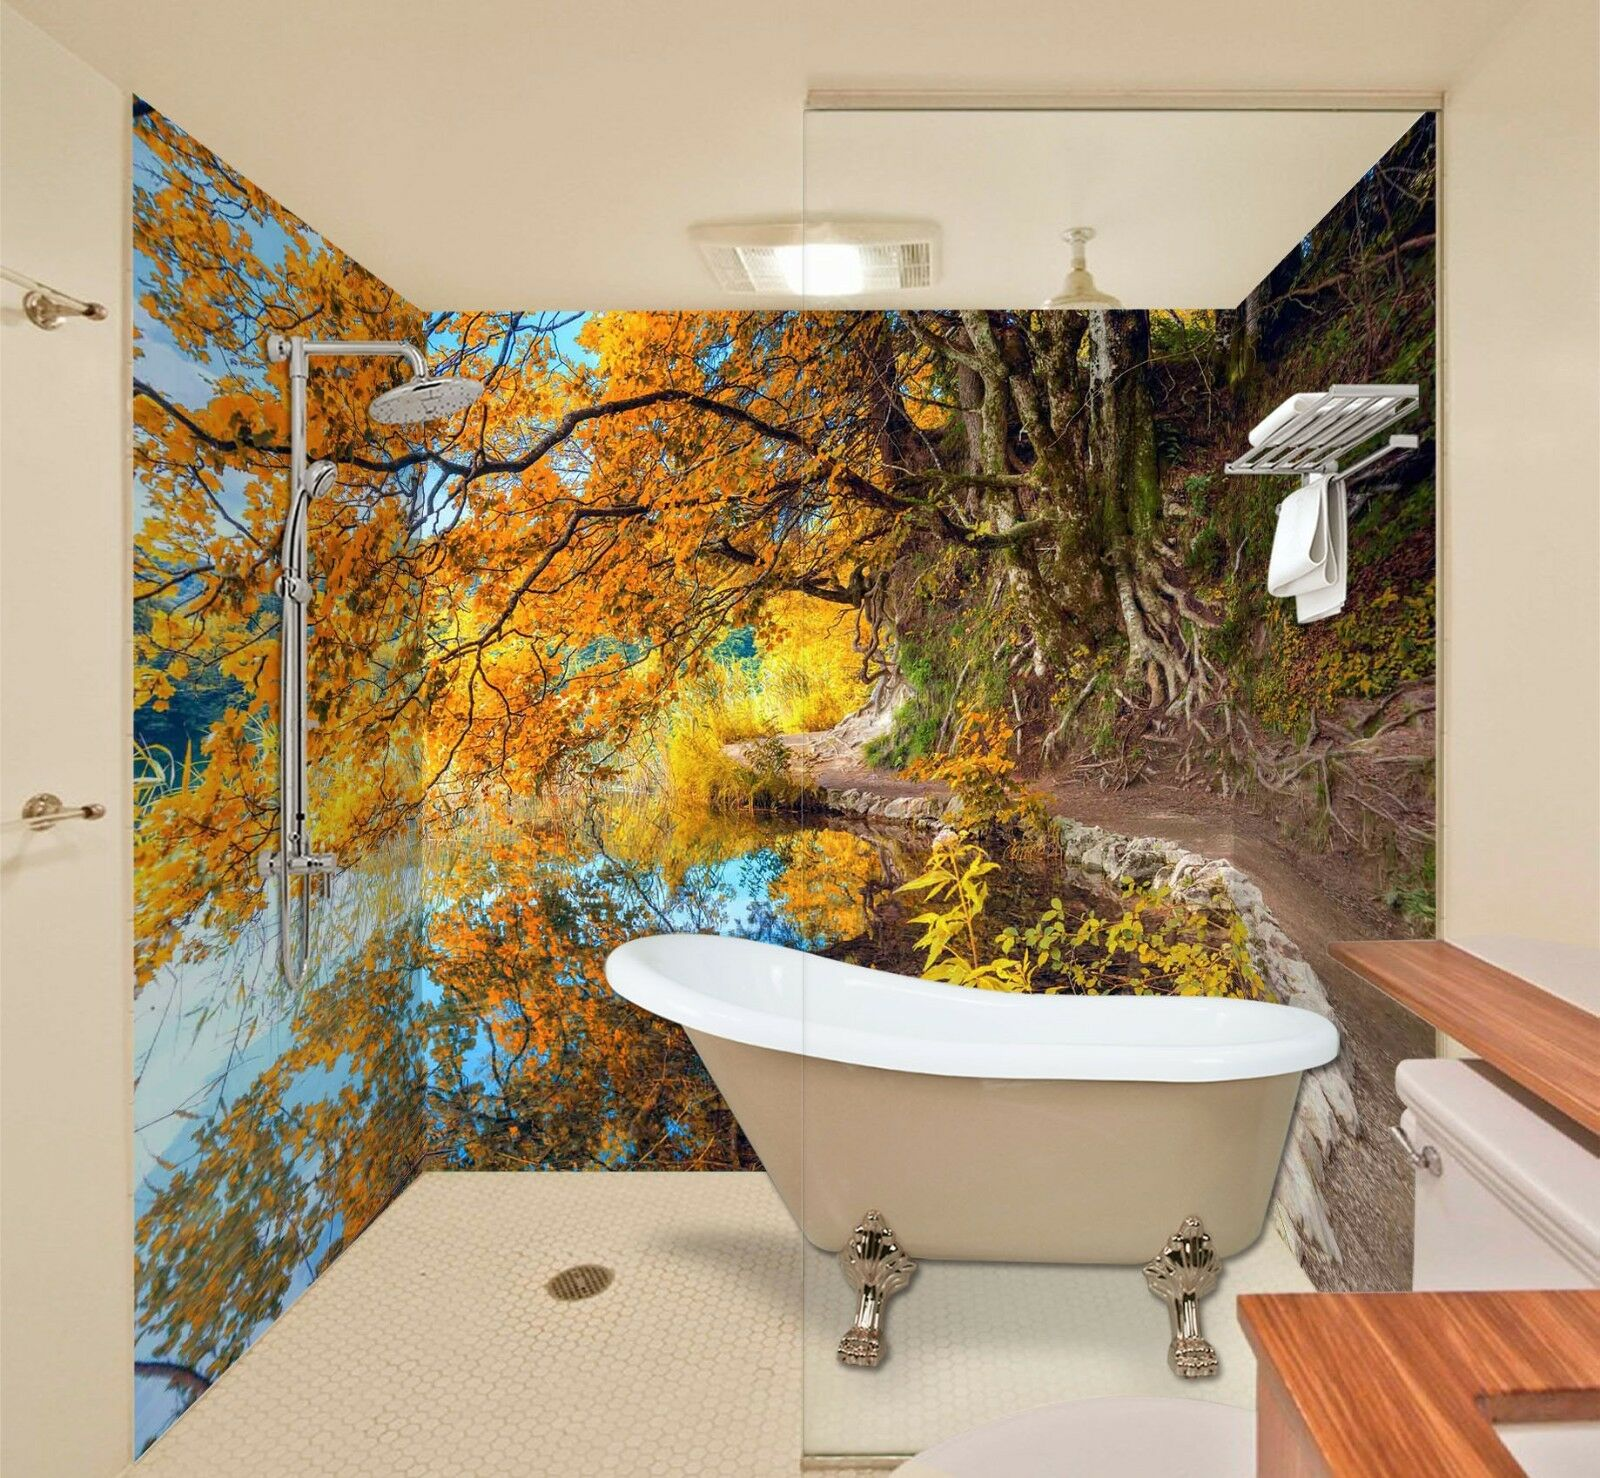 3D Trees lake sky 539 WallPaper Bathroom Print Decal Wall Deco AJ WALLPAPER UK